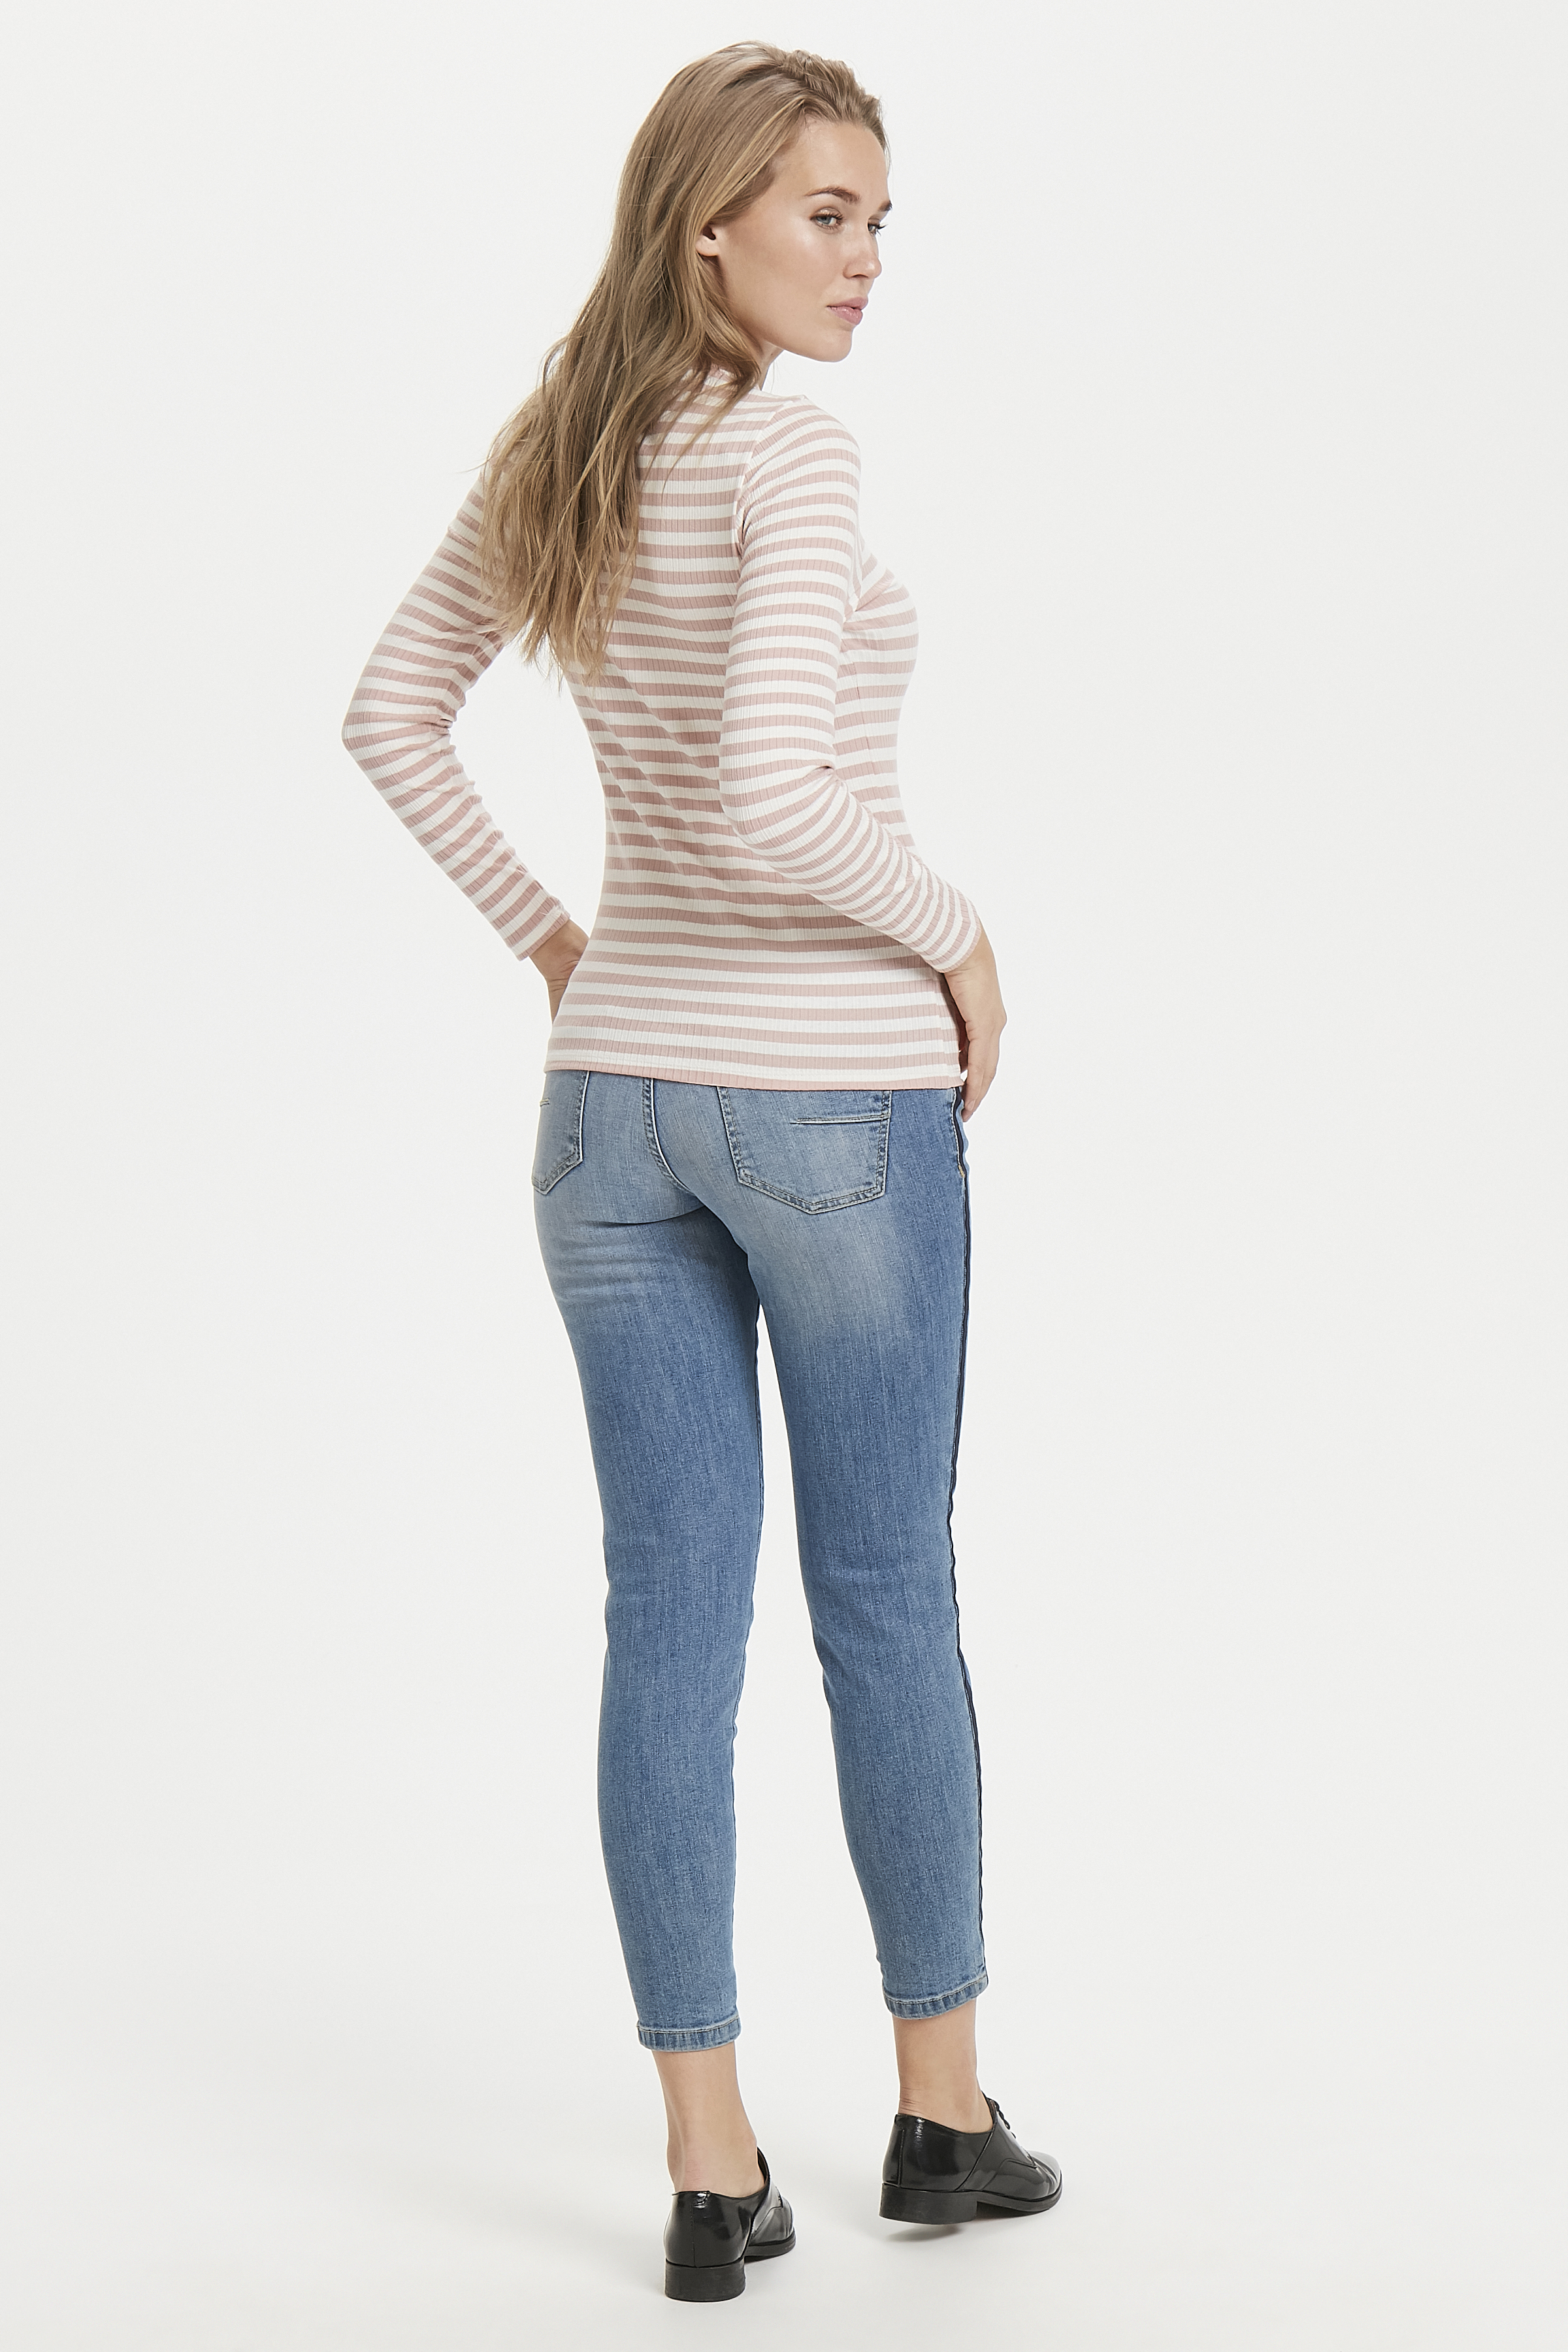 Rose Cloud combi Langarm-Shirt von b.young – Kaufen Sie Rose Cloud combi Langarm-Shirt aus Größe XS-XXL hier